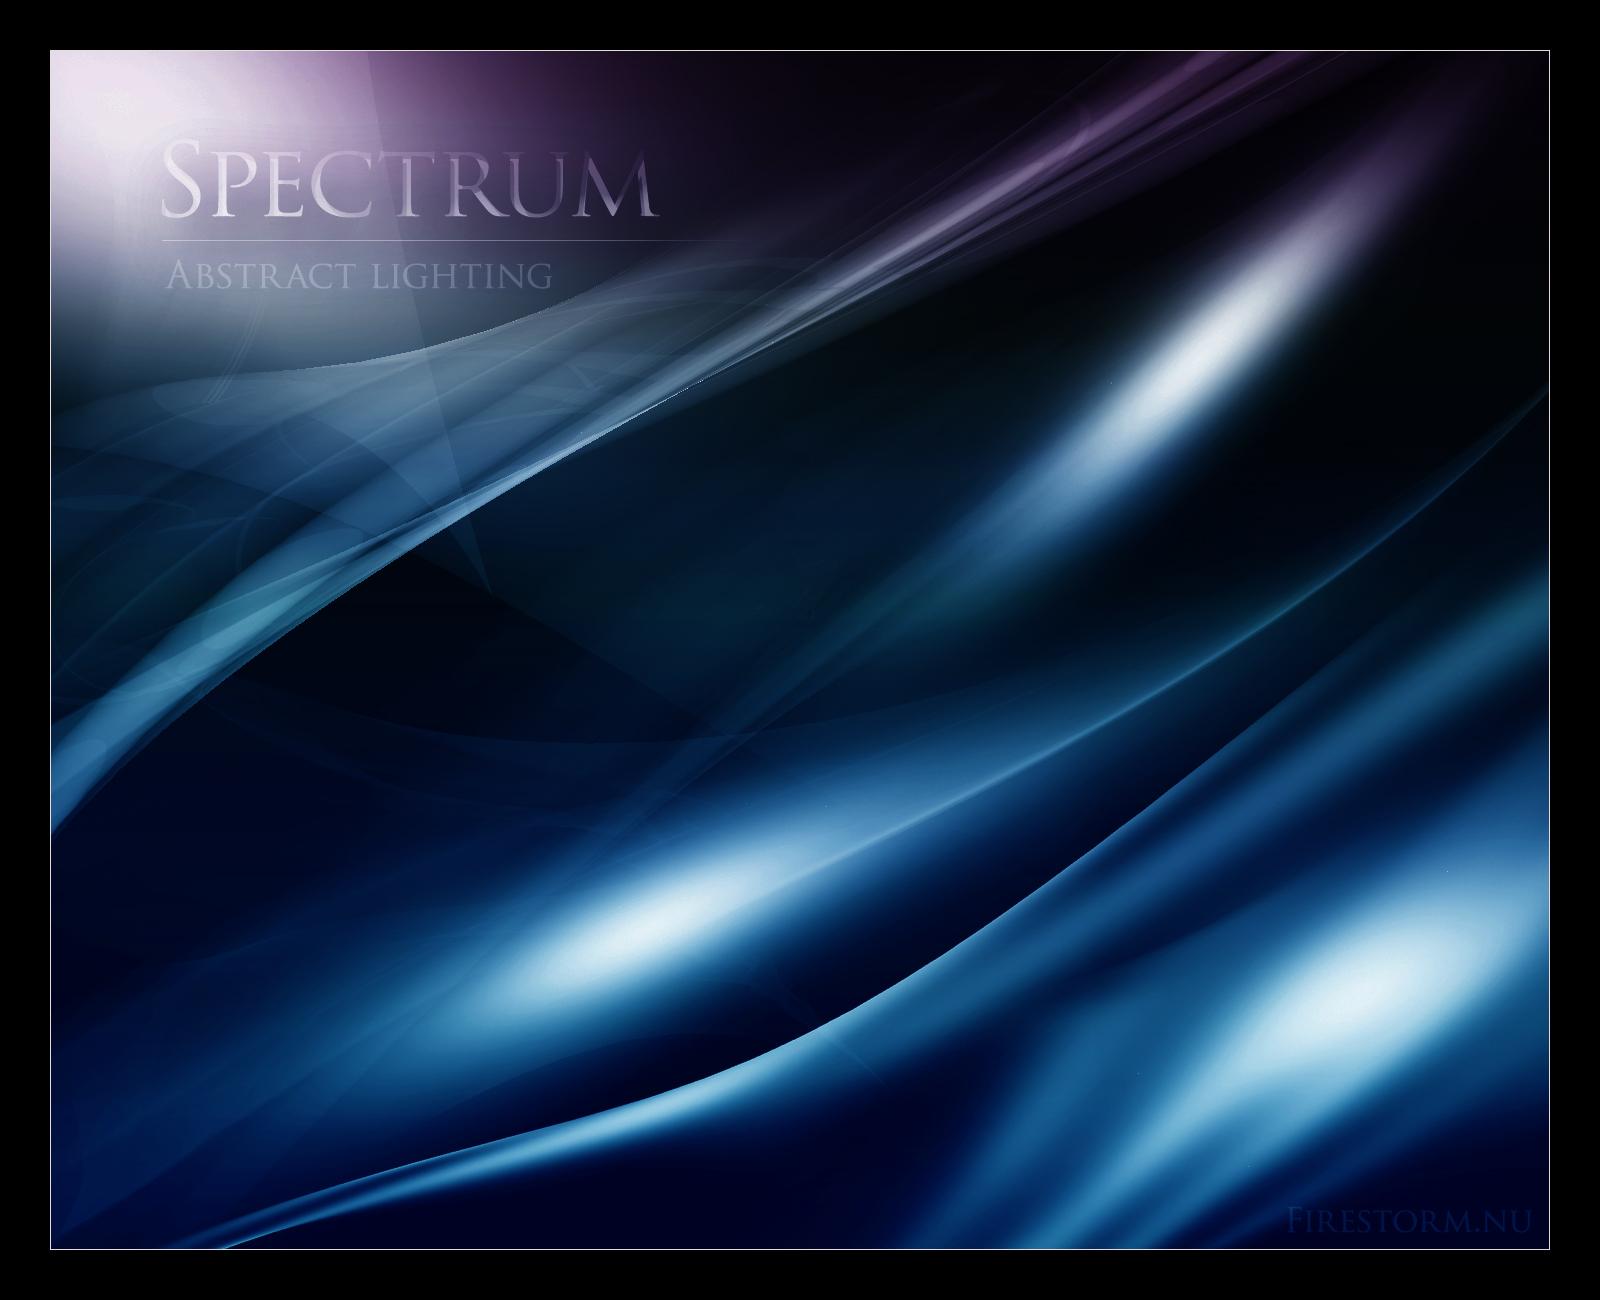 Spectrum by aleaja